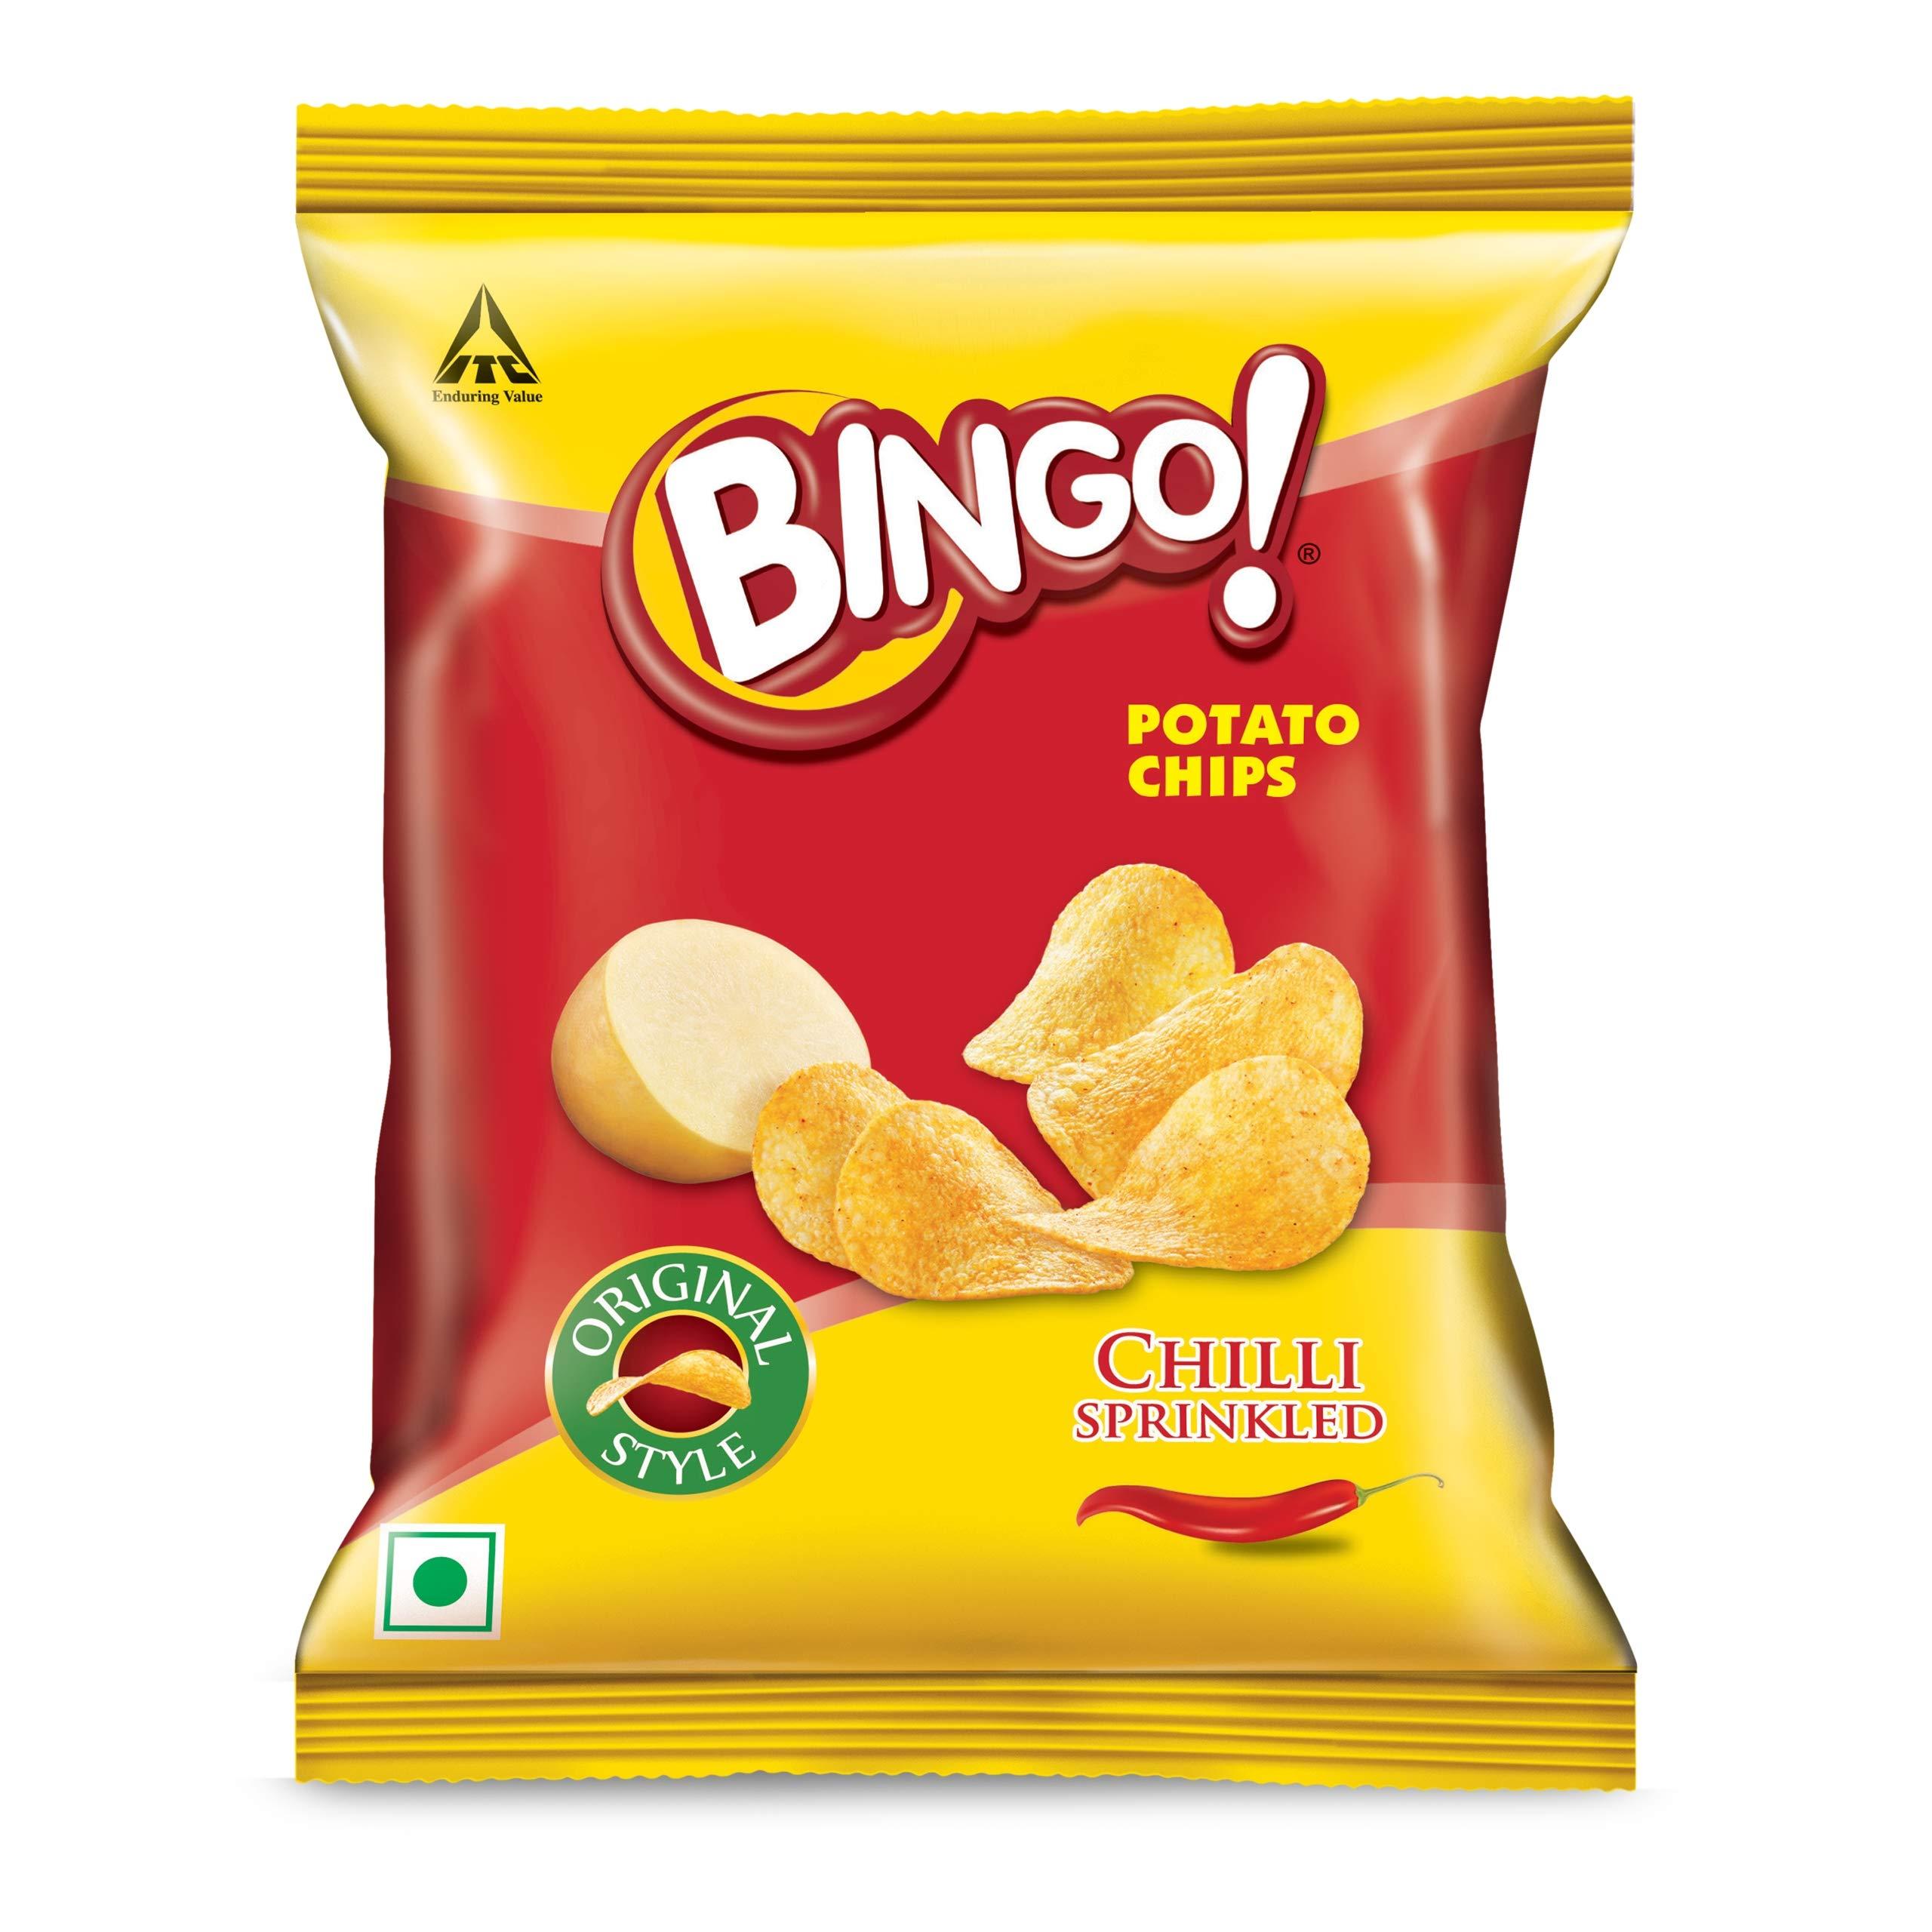 Bingo Potato Chips, Original Style Red Chilli sprinkled, 25.5g